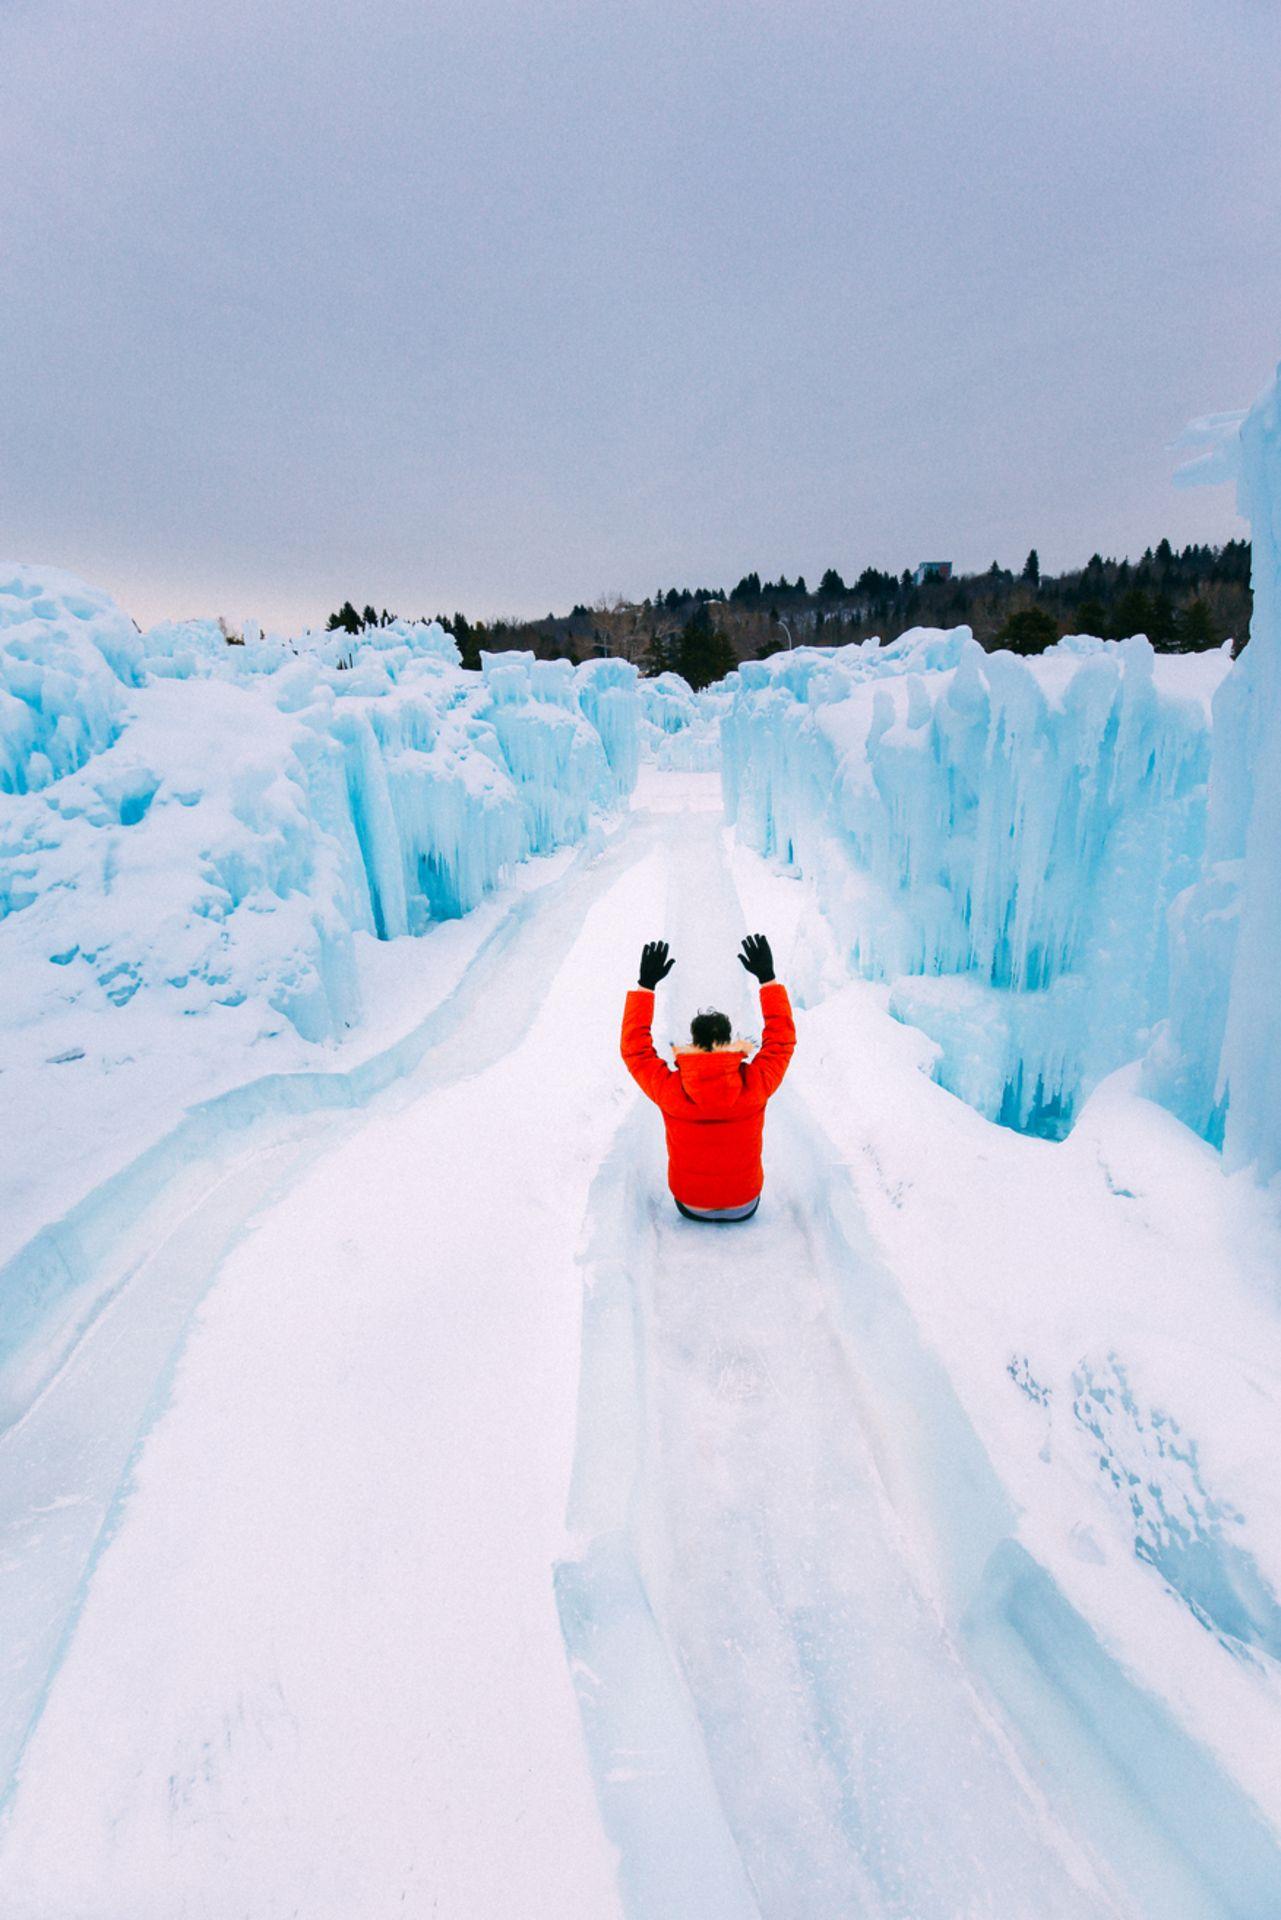 Hawrelak Park Edmonton, Alberta Ice castles, Canada